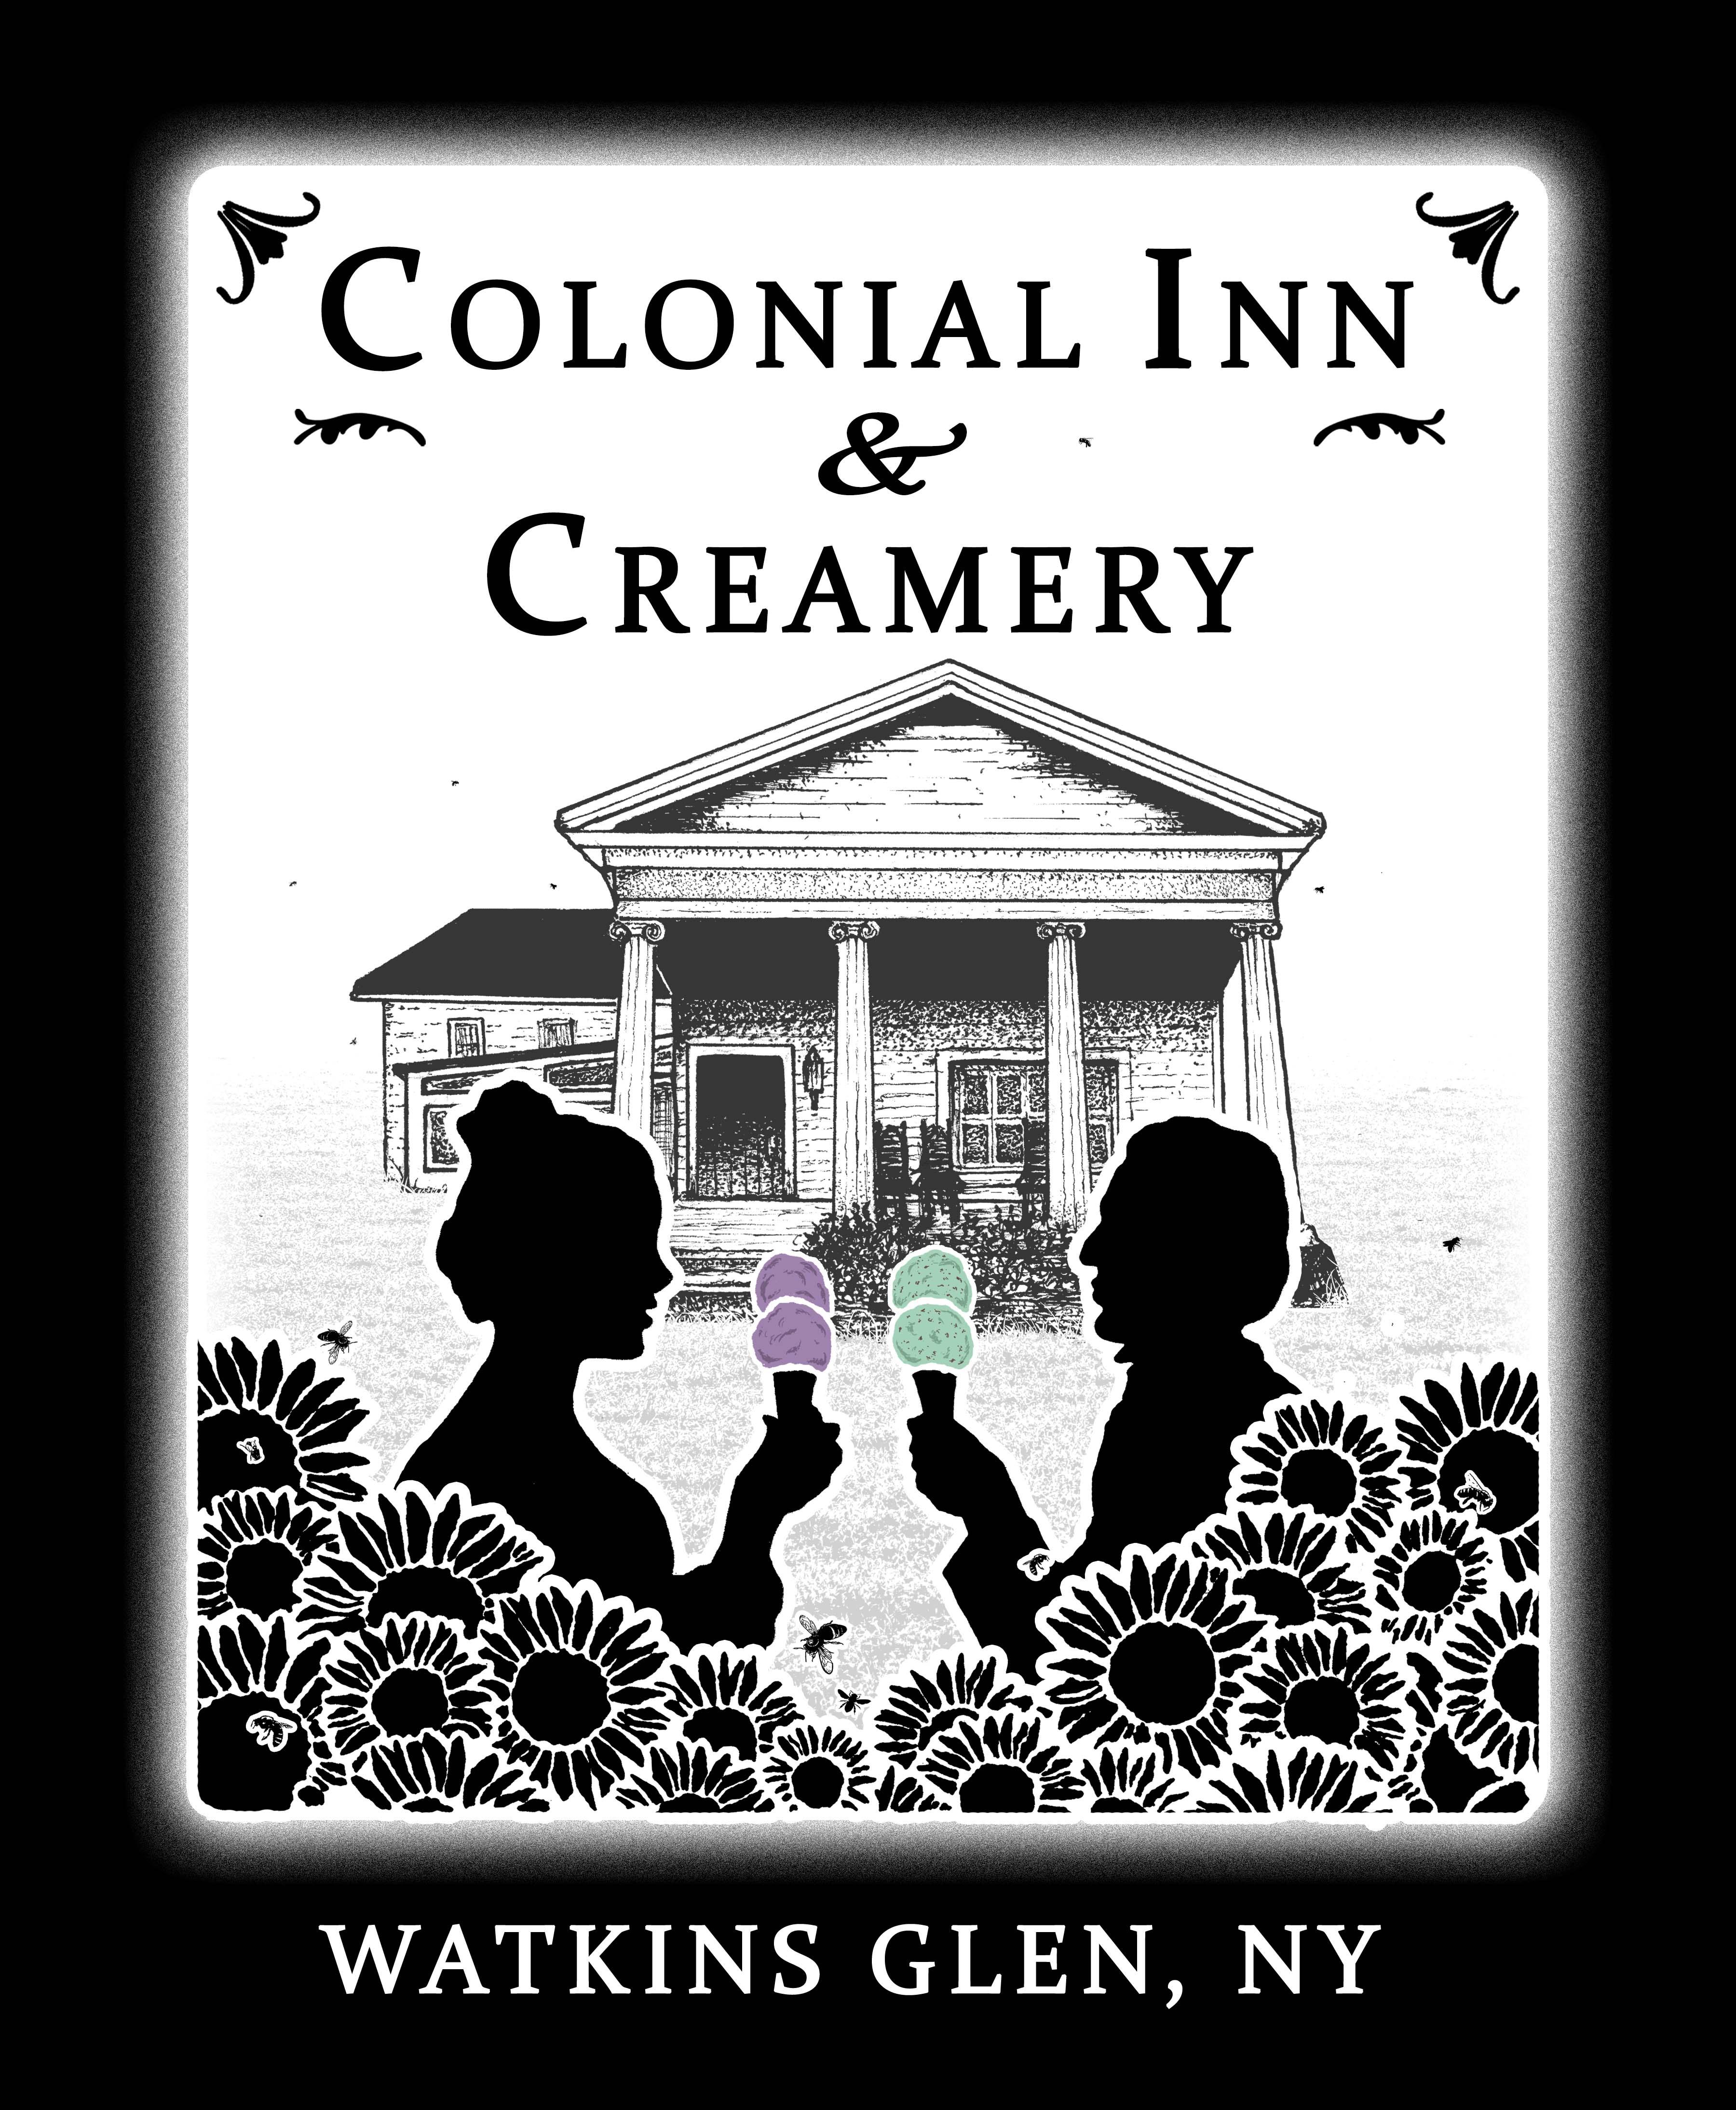 Colonial Inn & Creamery